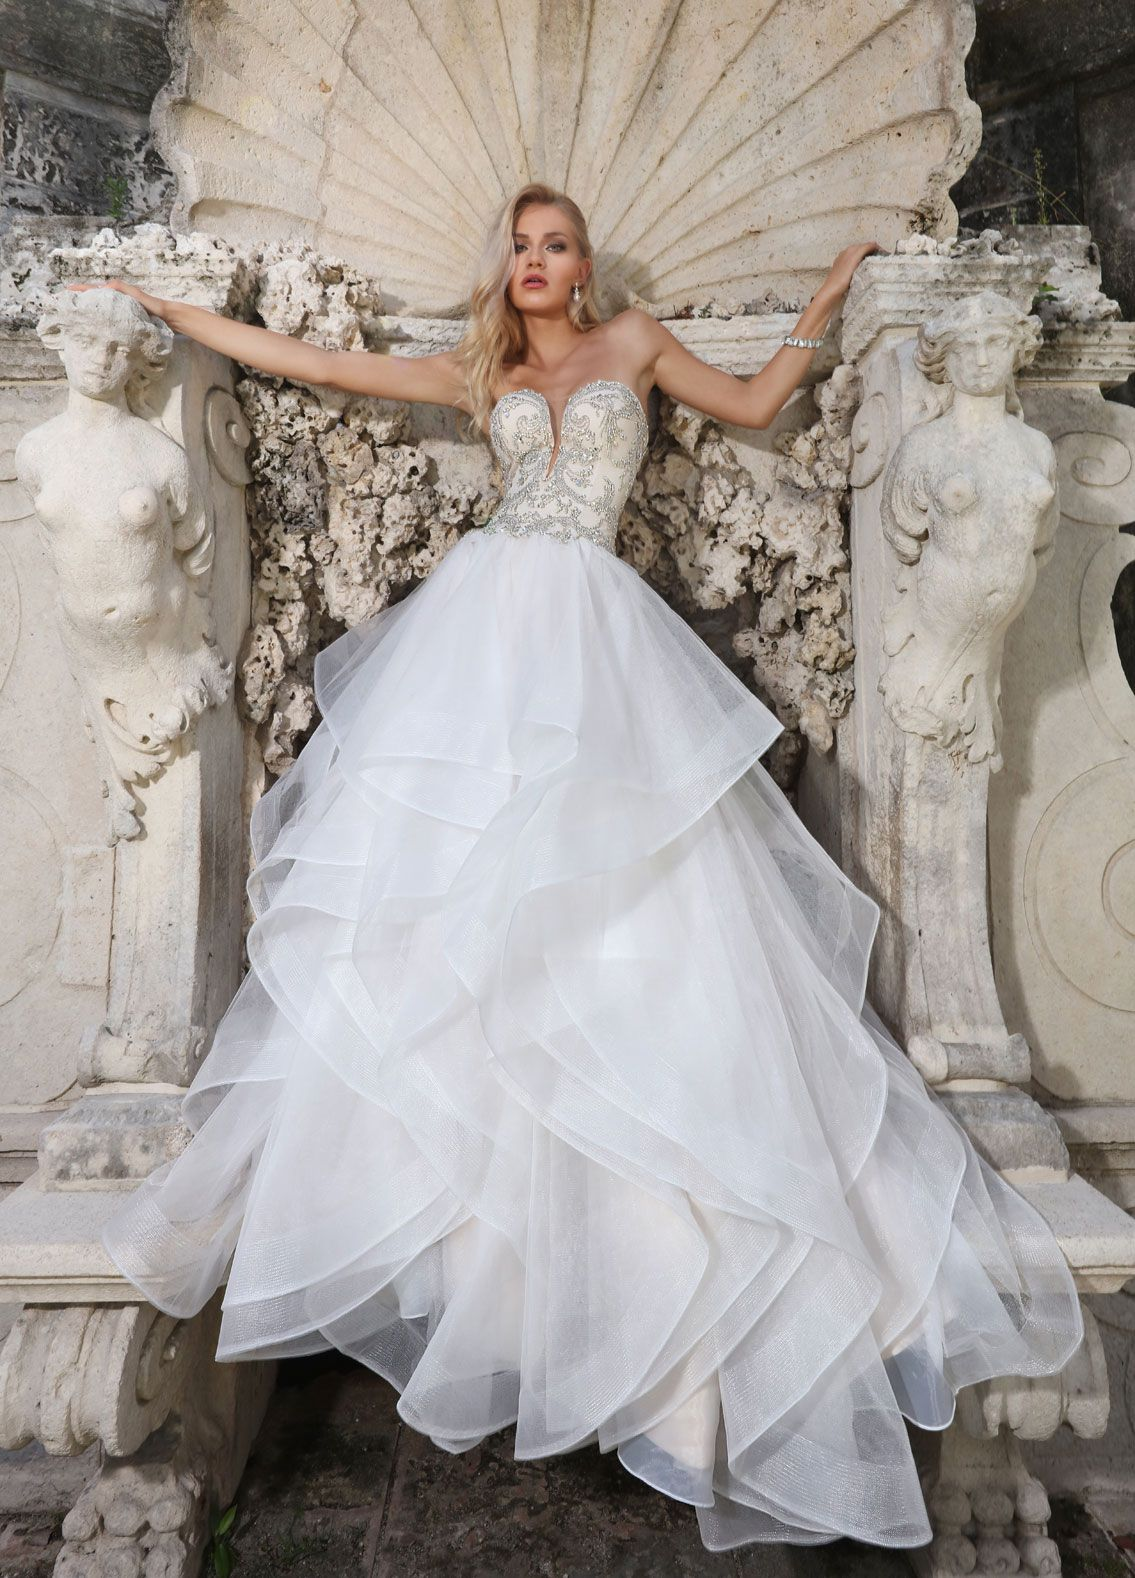 Style ashley u justin bride wedding dress pinterest